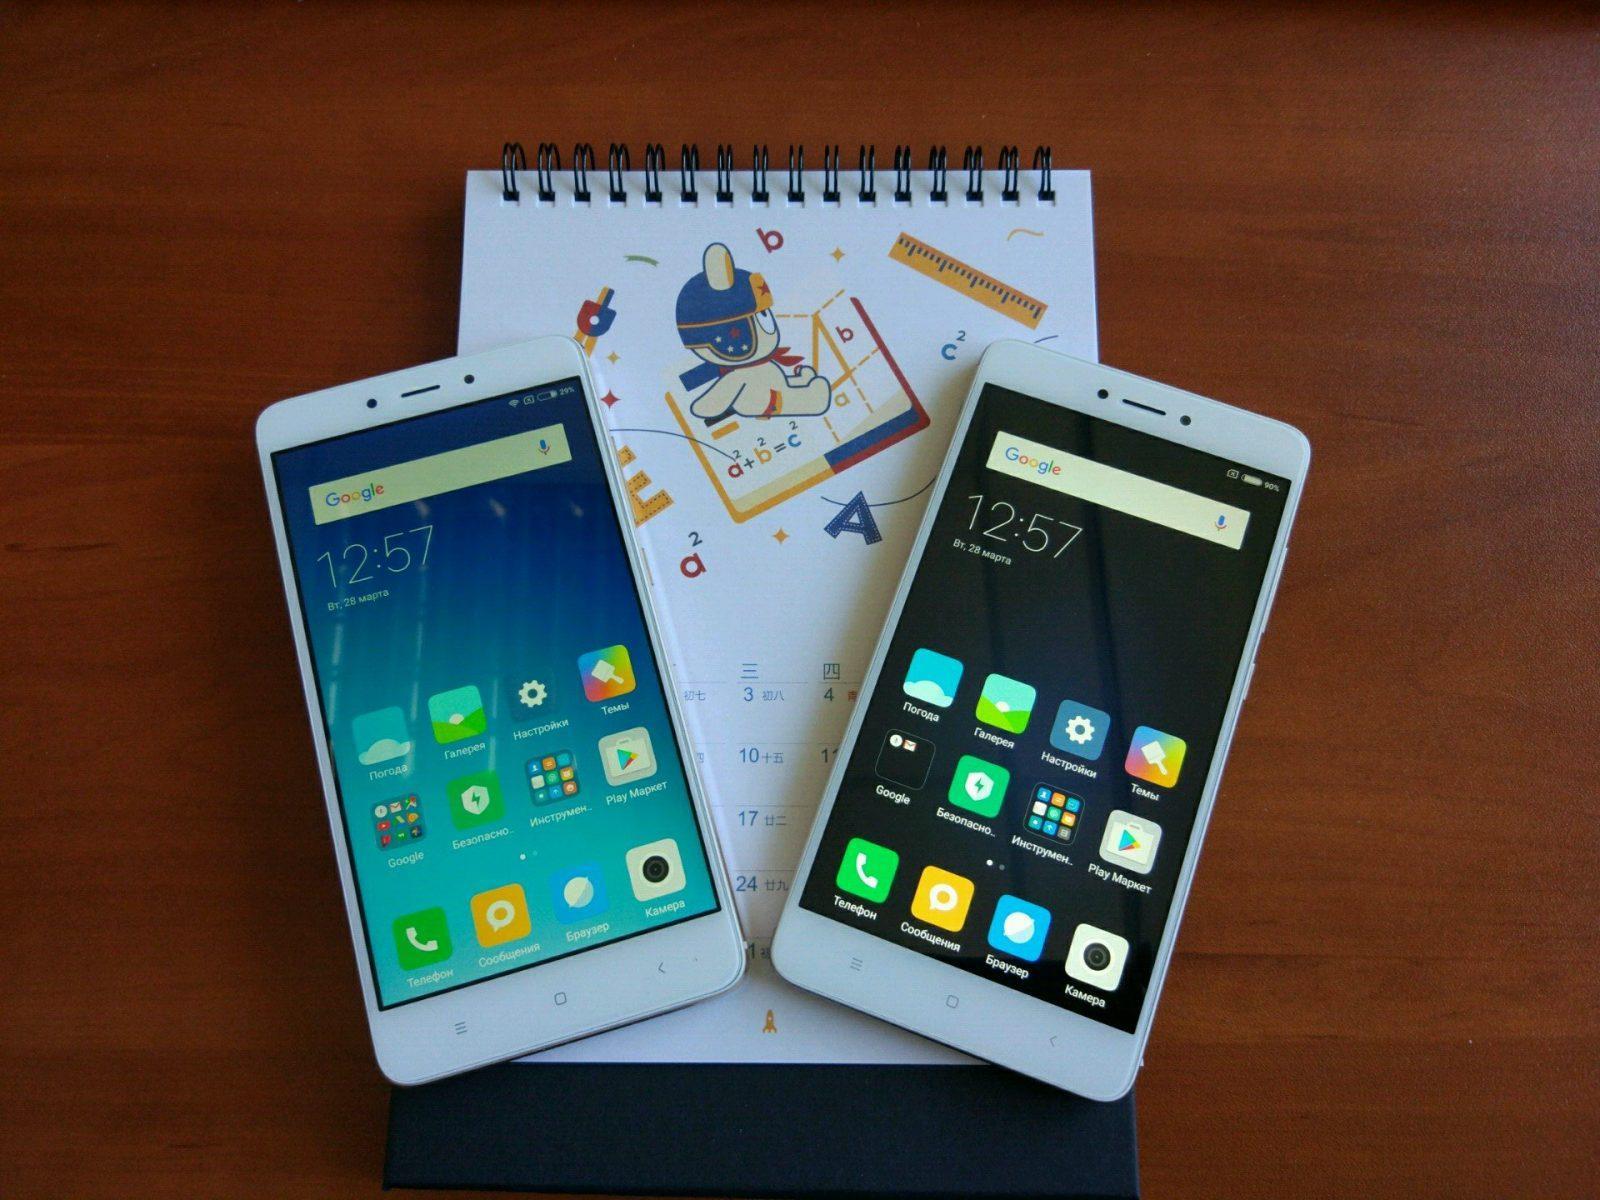 В сравнении с Redmi Note 4